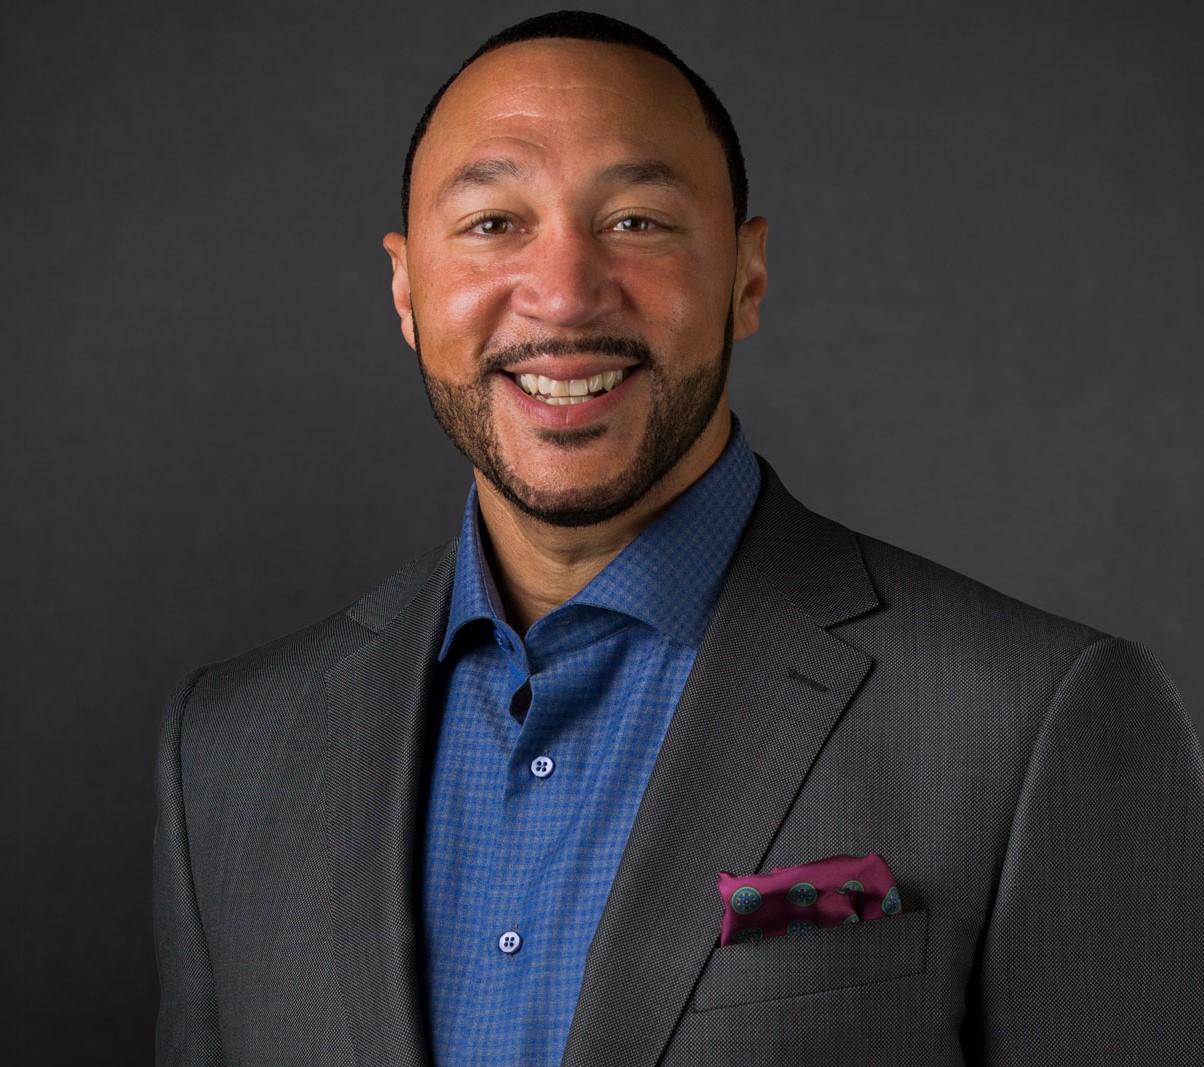 Featured in Hemp Grower:   Former Super Bowl Champ Charlie Batch Joins Hemp Synergistics Advisory Board